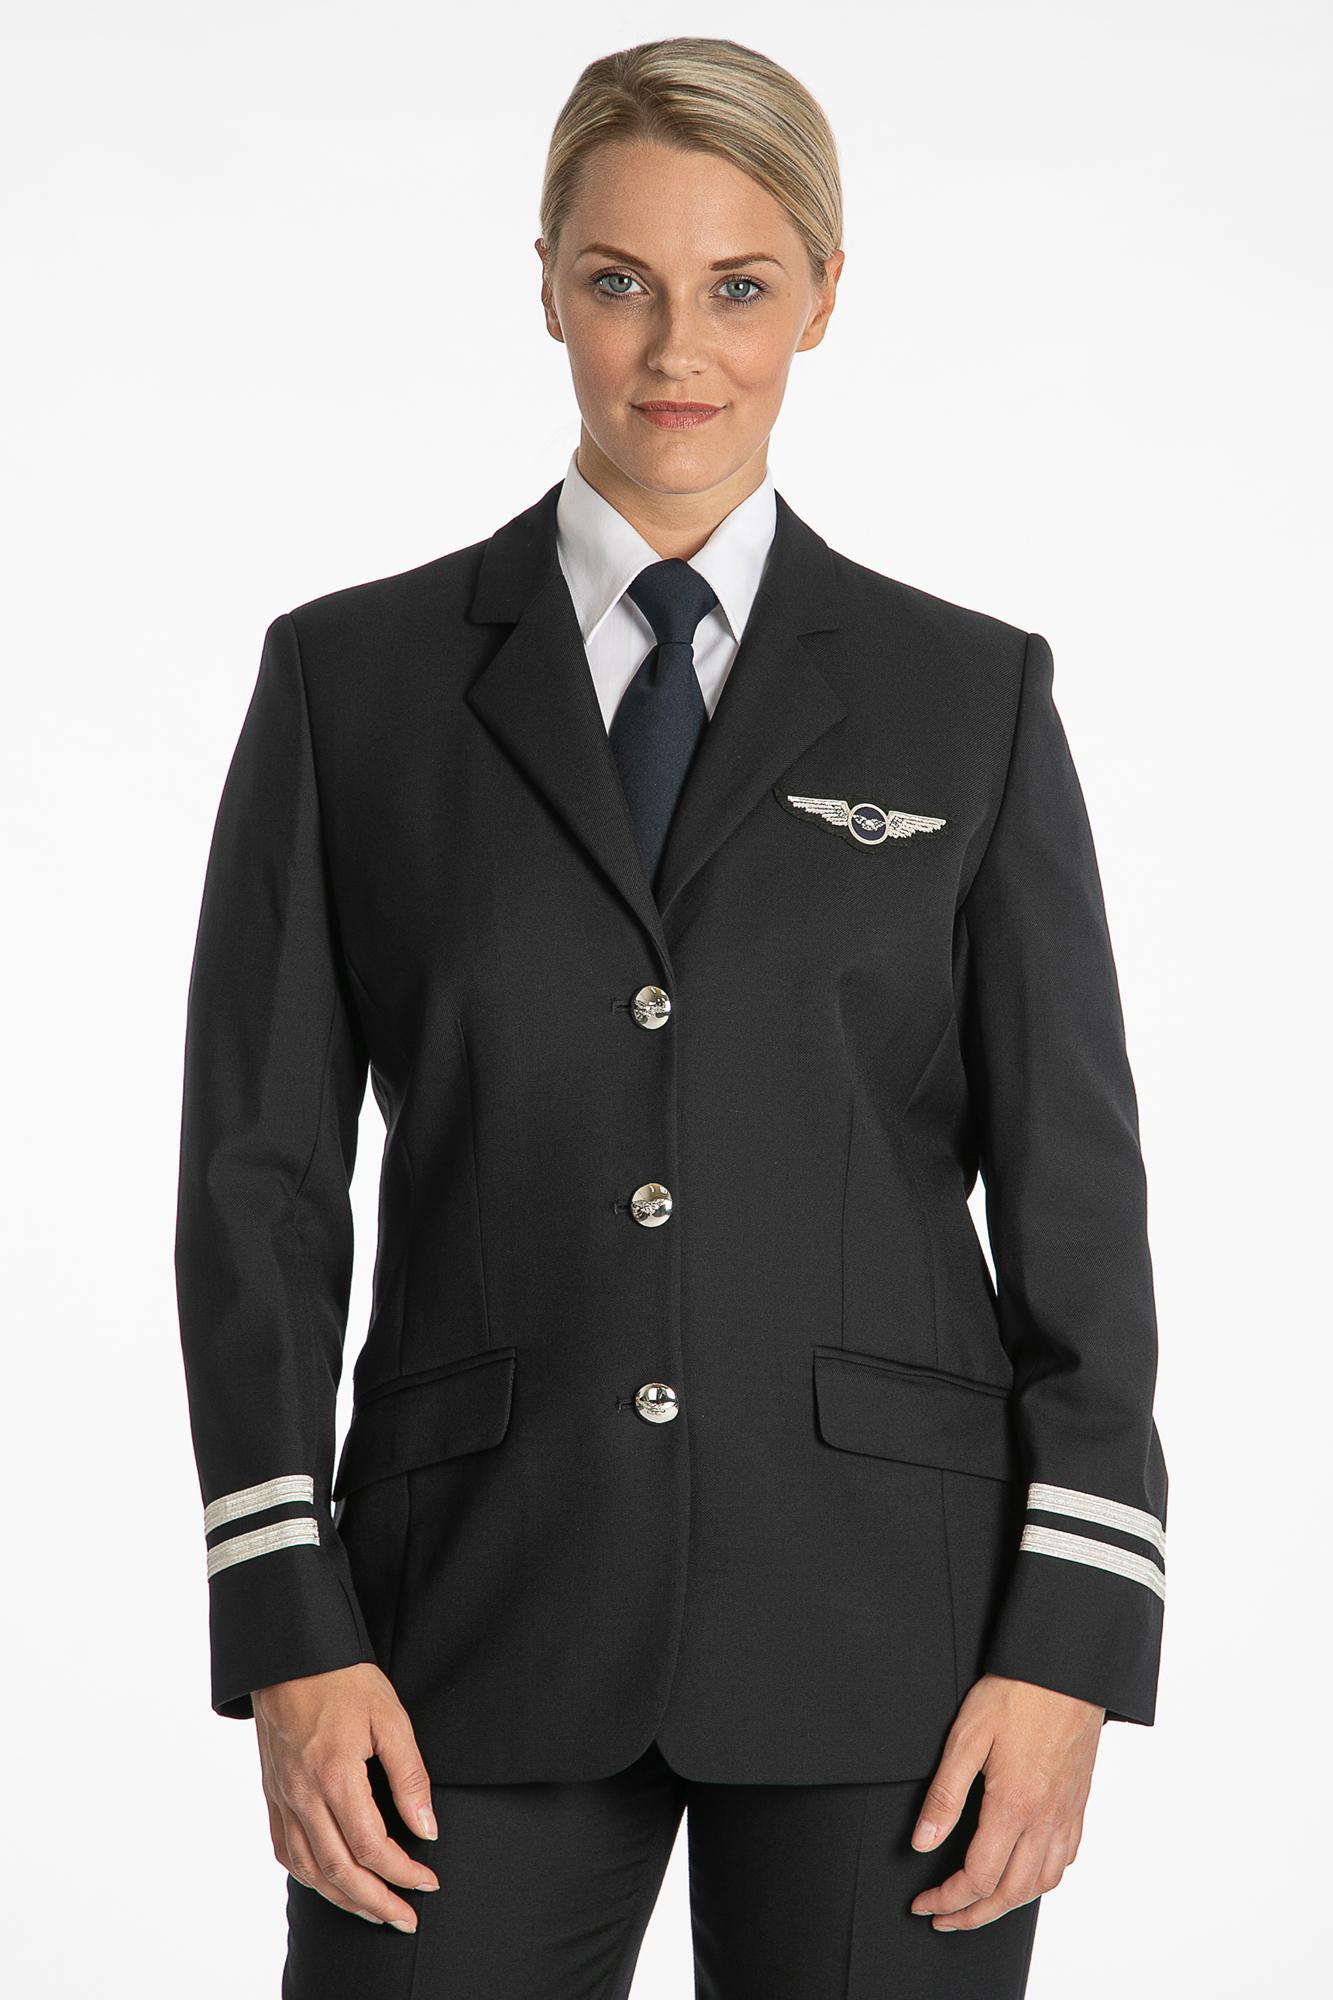 LADIES PILOT UNIFORM SINGLE BREASTED JACKET BLACK / NAVY